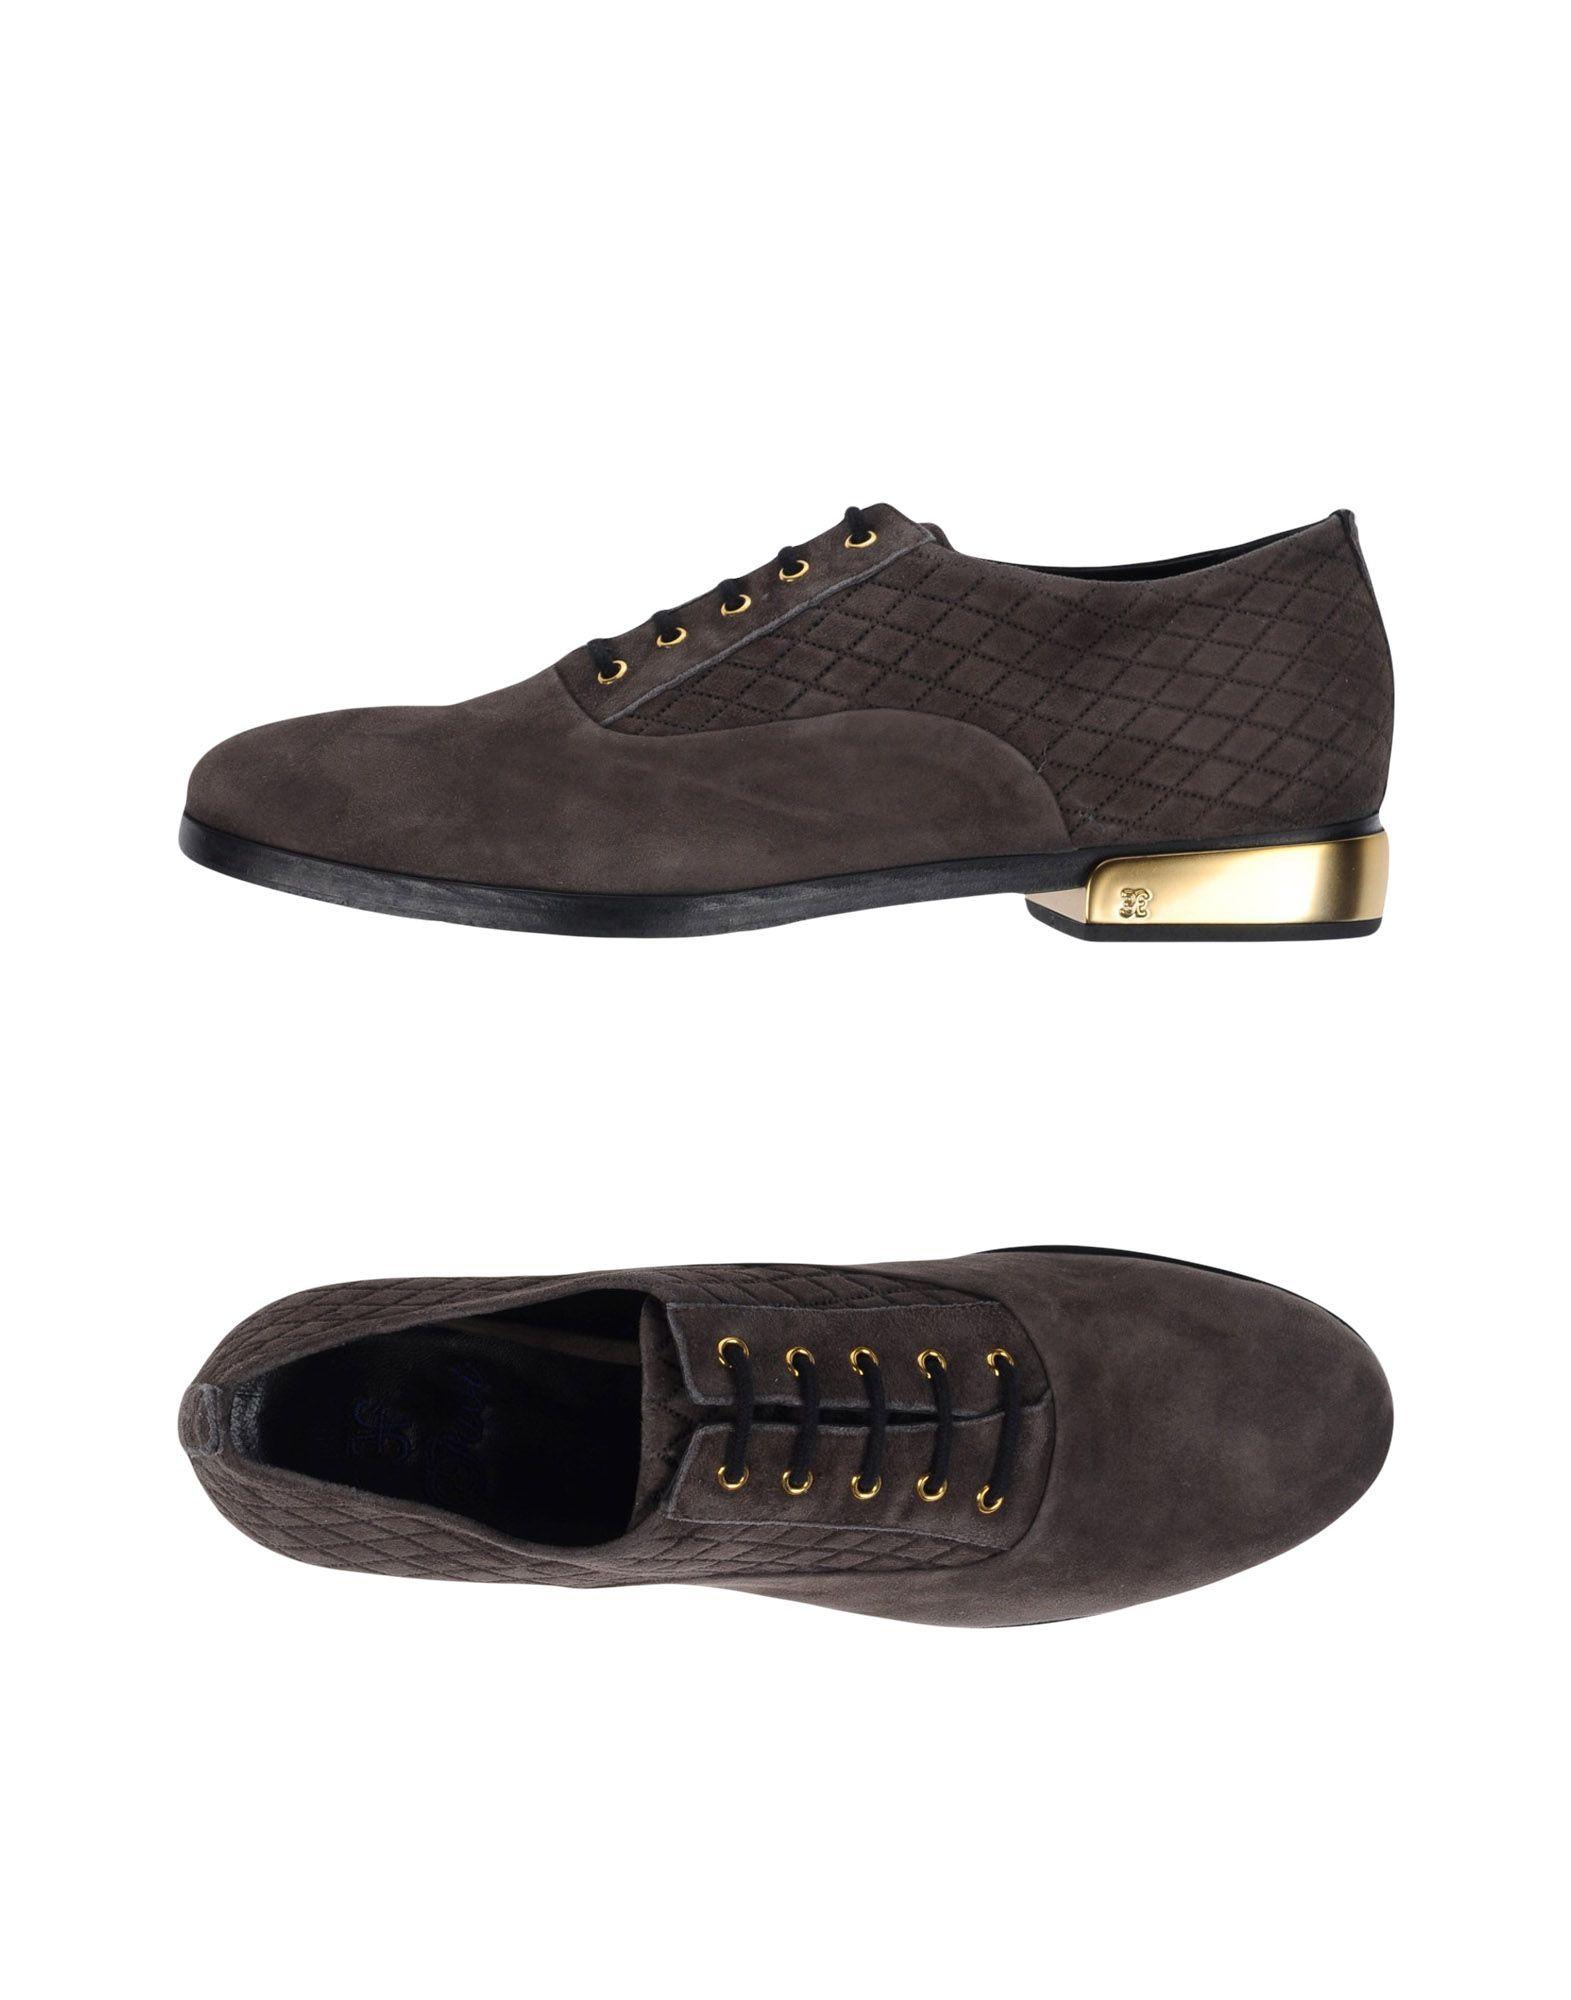 Fabi Schnürschuhe Damen  11302082QQ Gute Qualität beliebte Schuhe